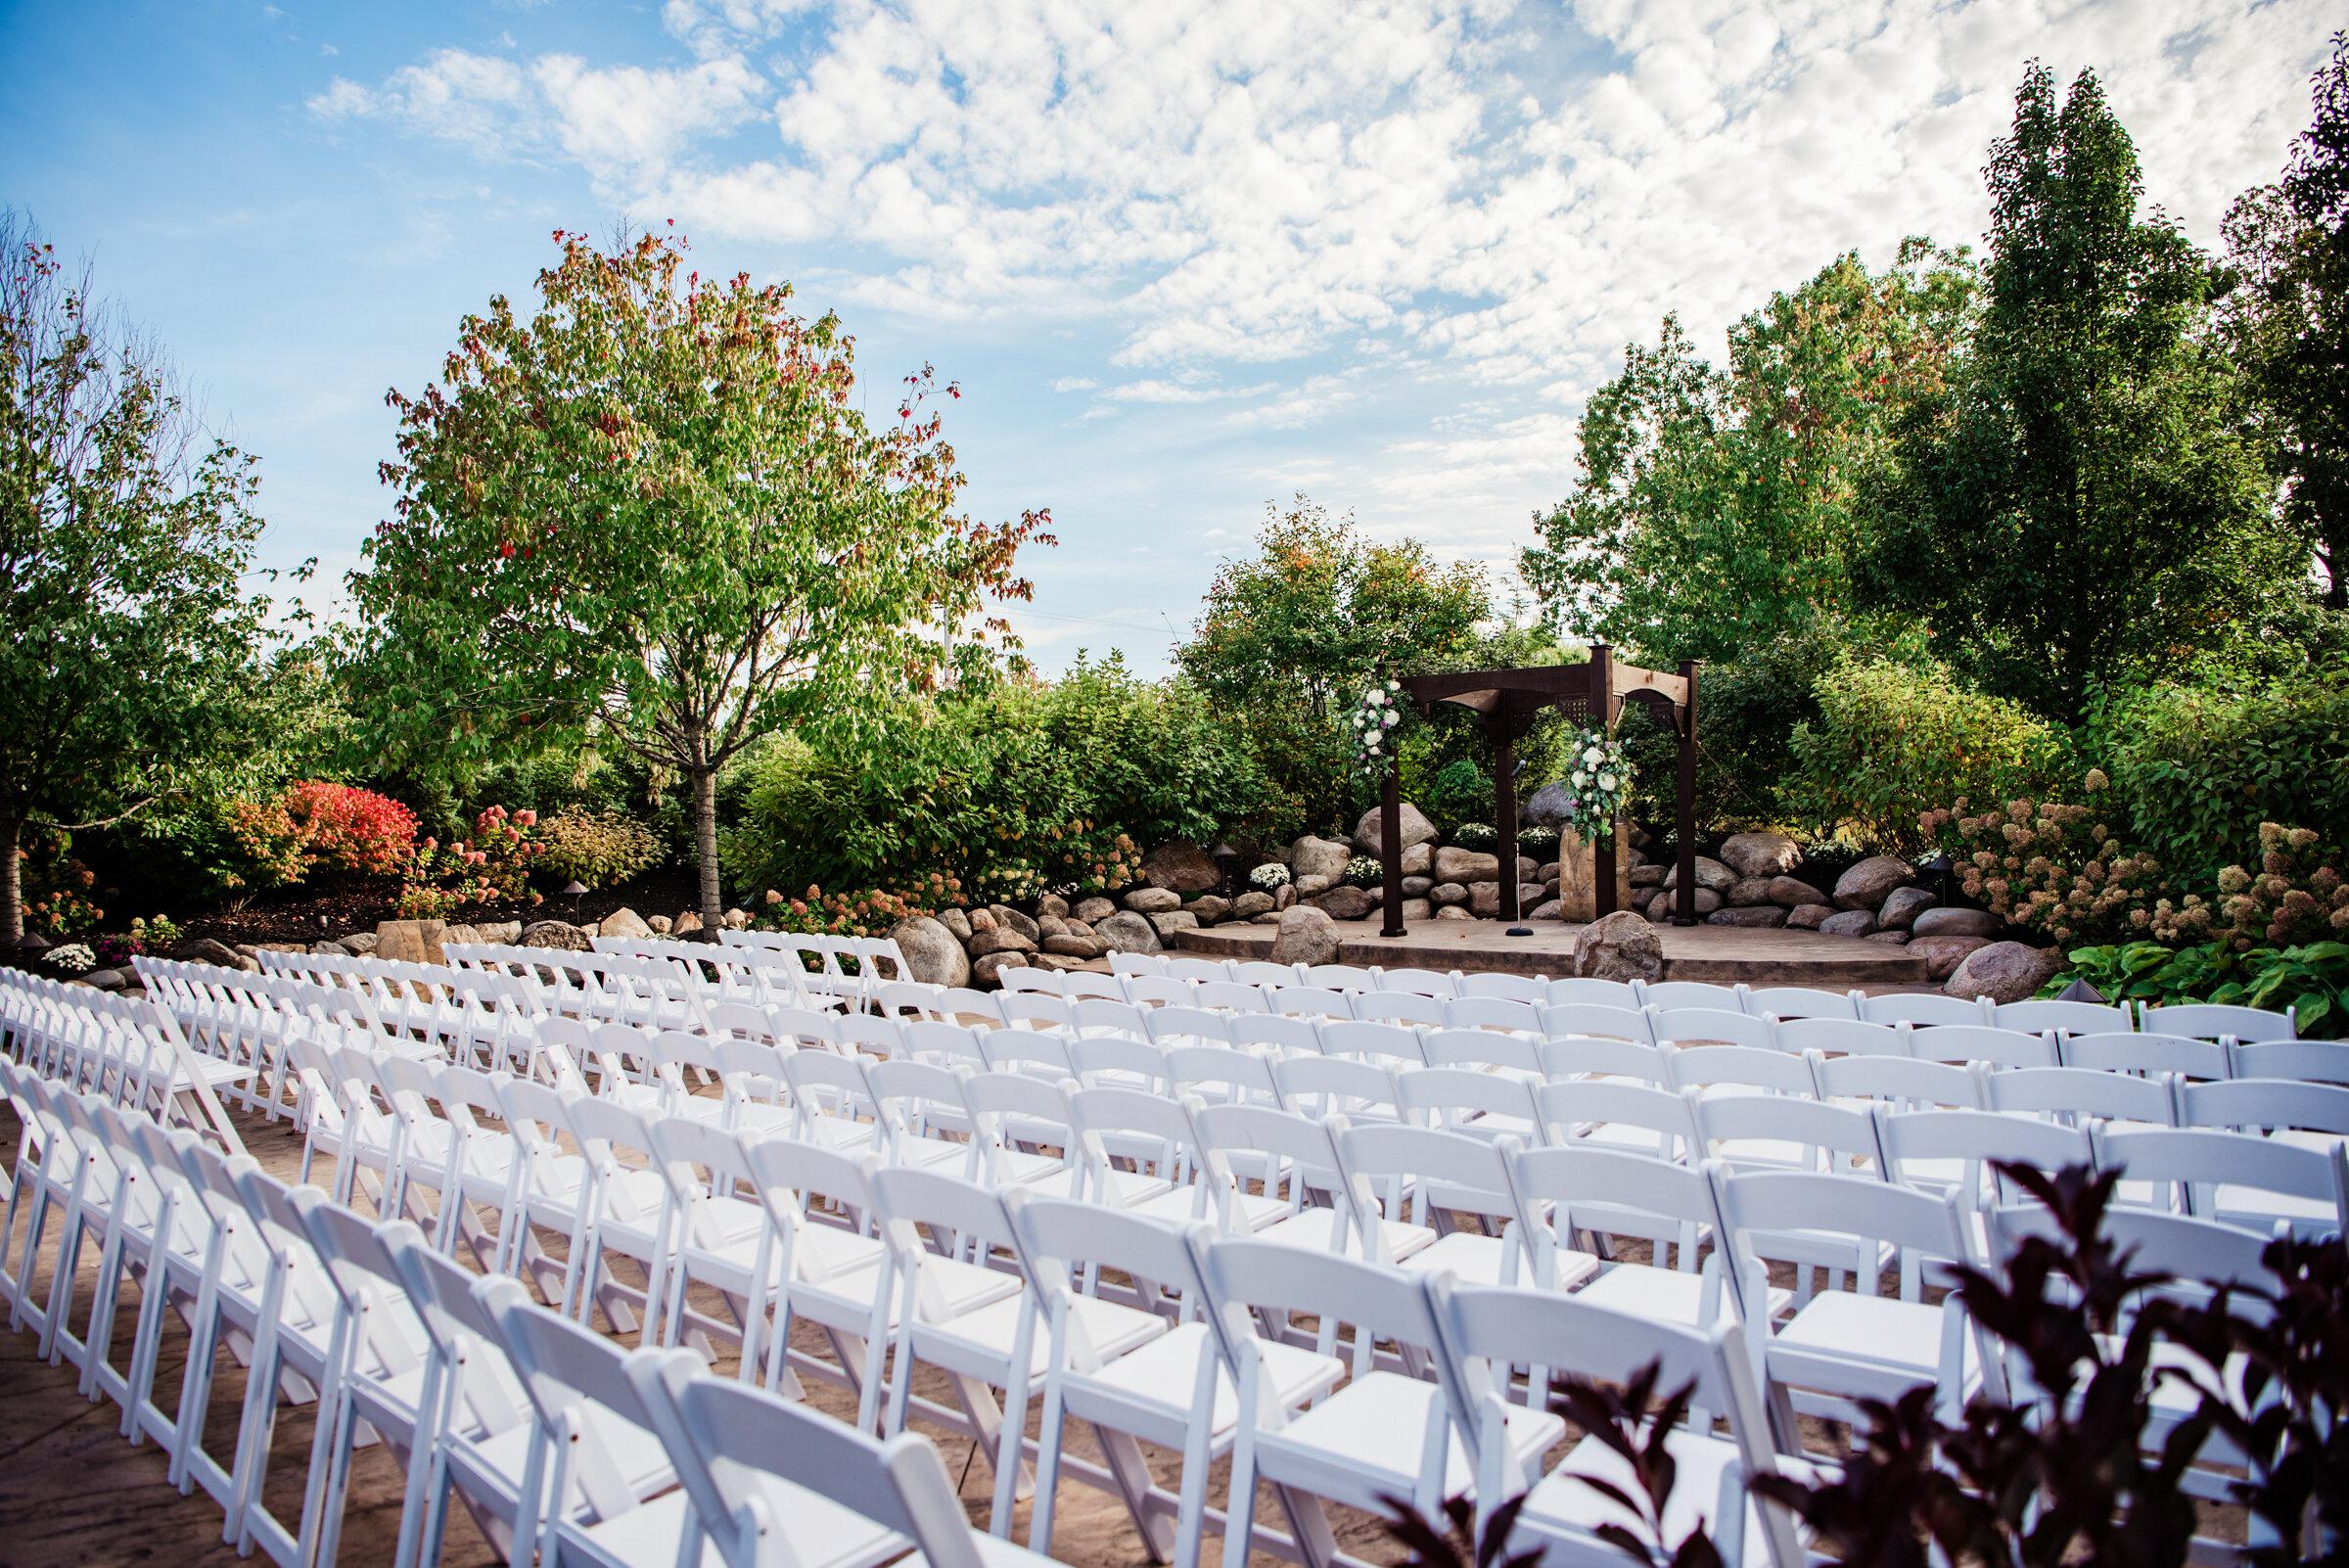 Deerfield_Country_Club_Rochester_Wedding_JILL_STUDIO_Rochester_NY_Photographer_DSC_6670.jpg